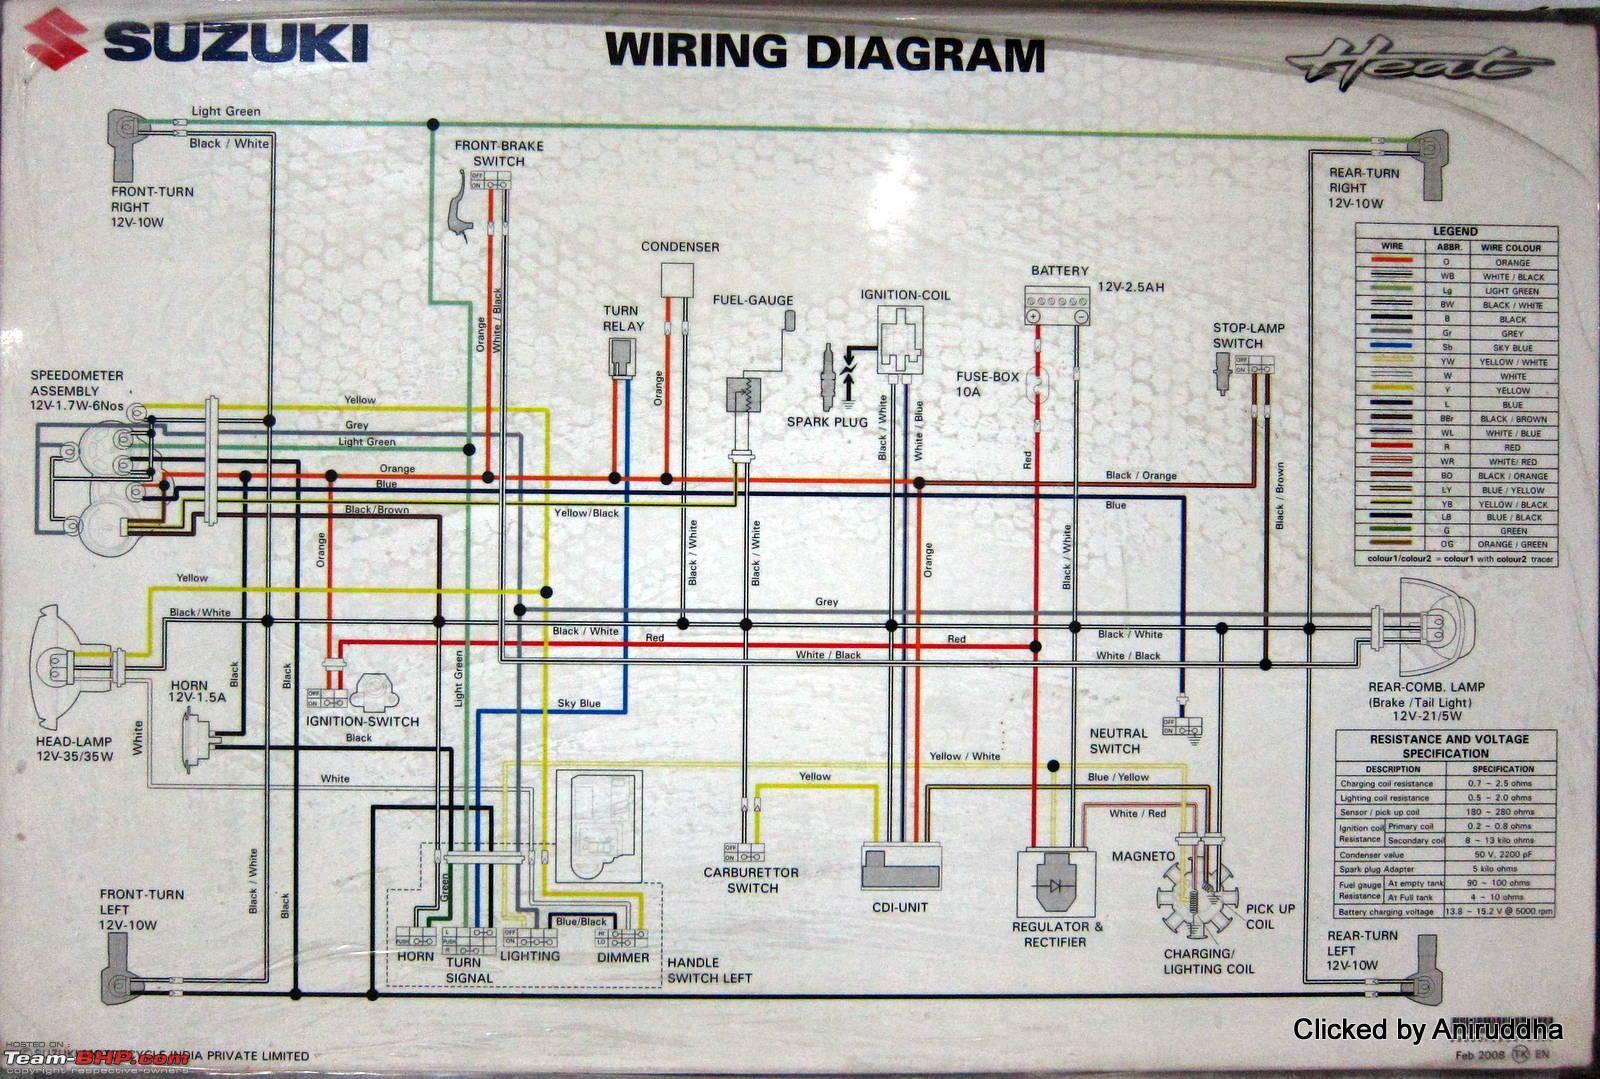 1937 Indian Motorcycle Wiring Diagram Online Schematic Diagram \u2022 05  Chrysler 300 2 7 Engine Wiring Diagram Victory Motorcycle Wiring Diagrams